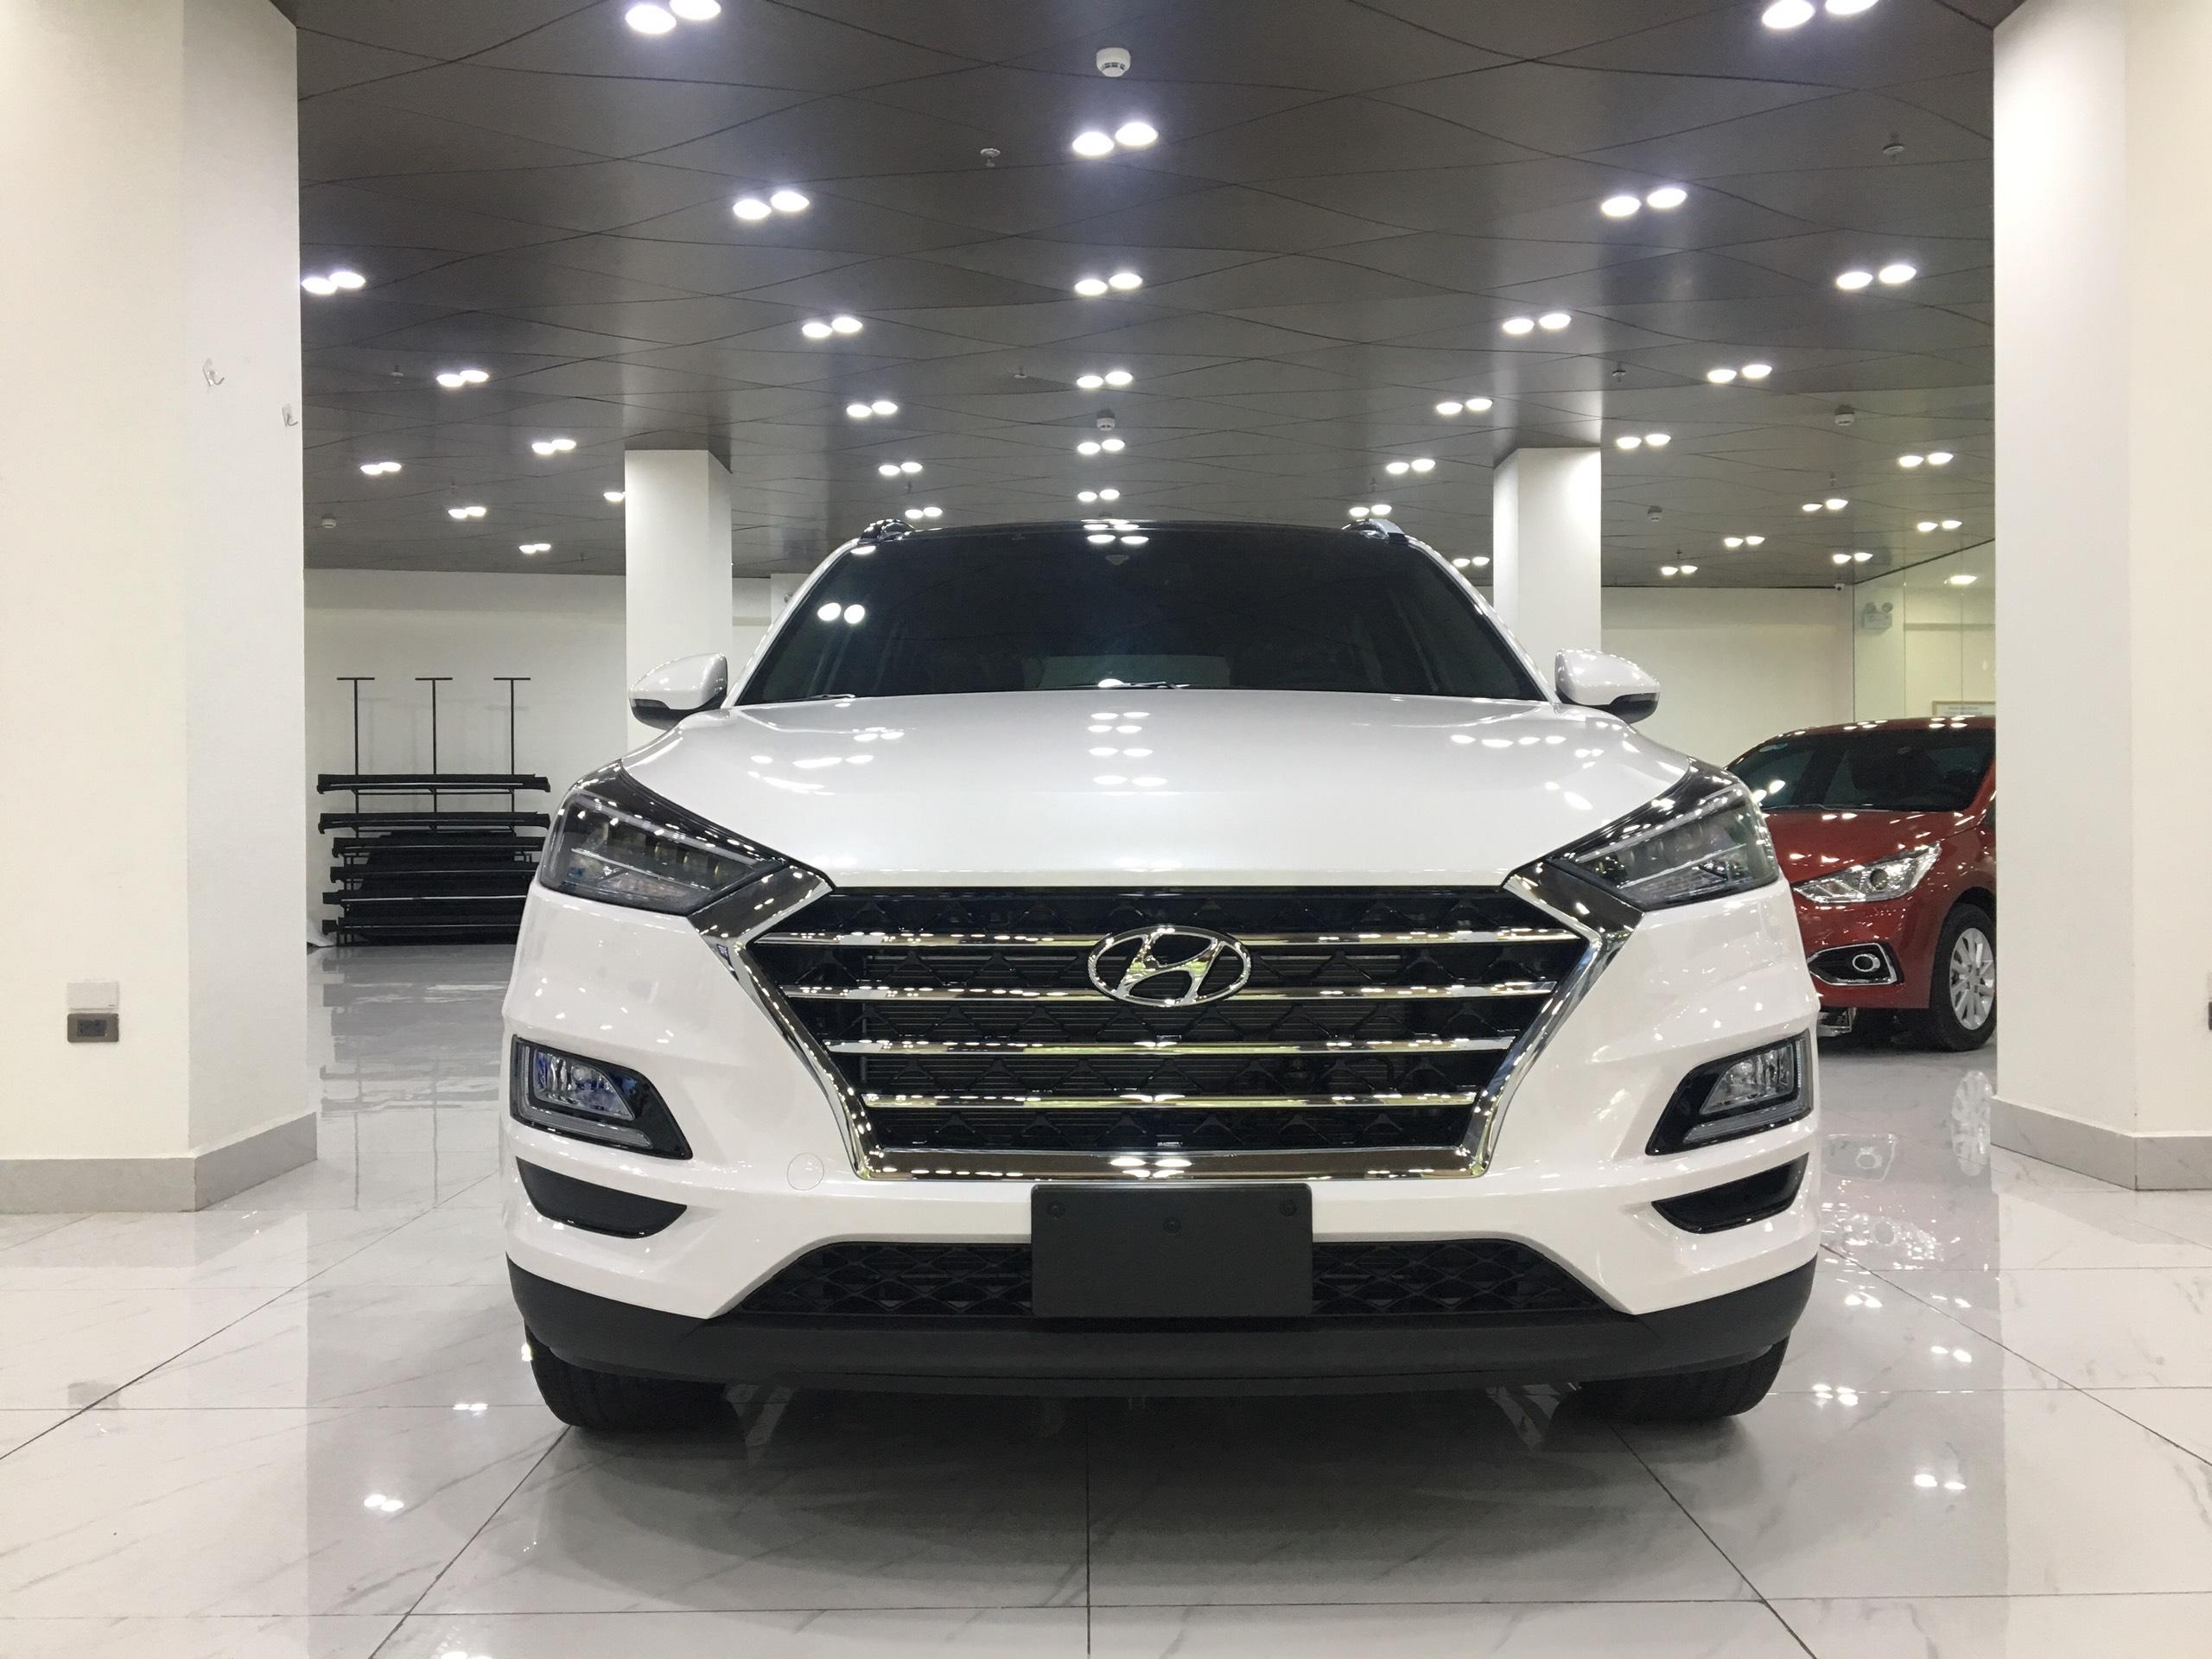 Hyundai Tucson 2.0 AT Đặc biệt 2019 (3)